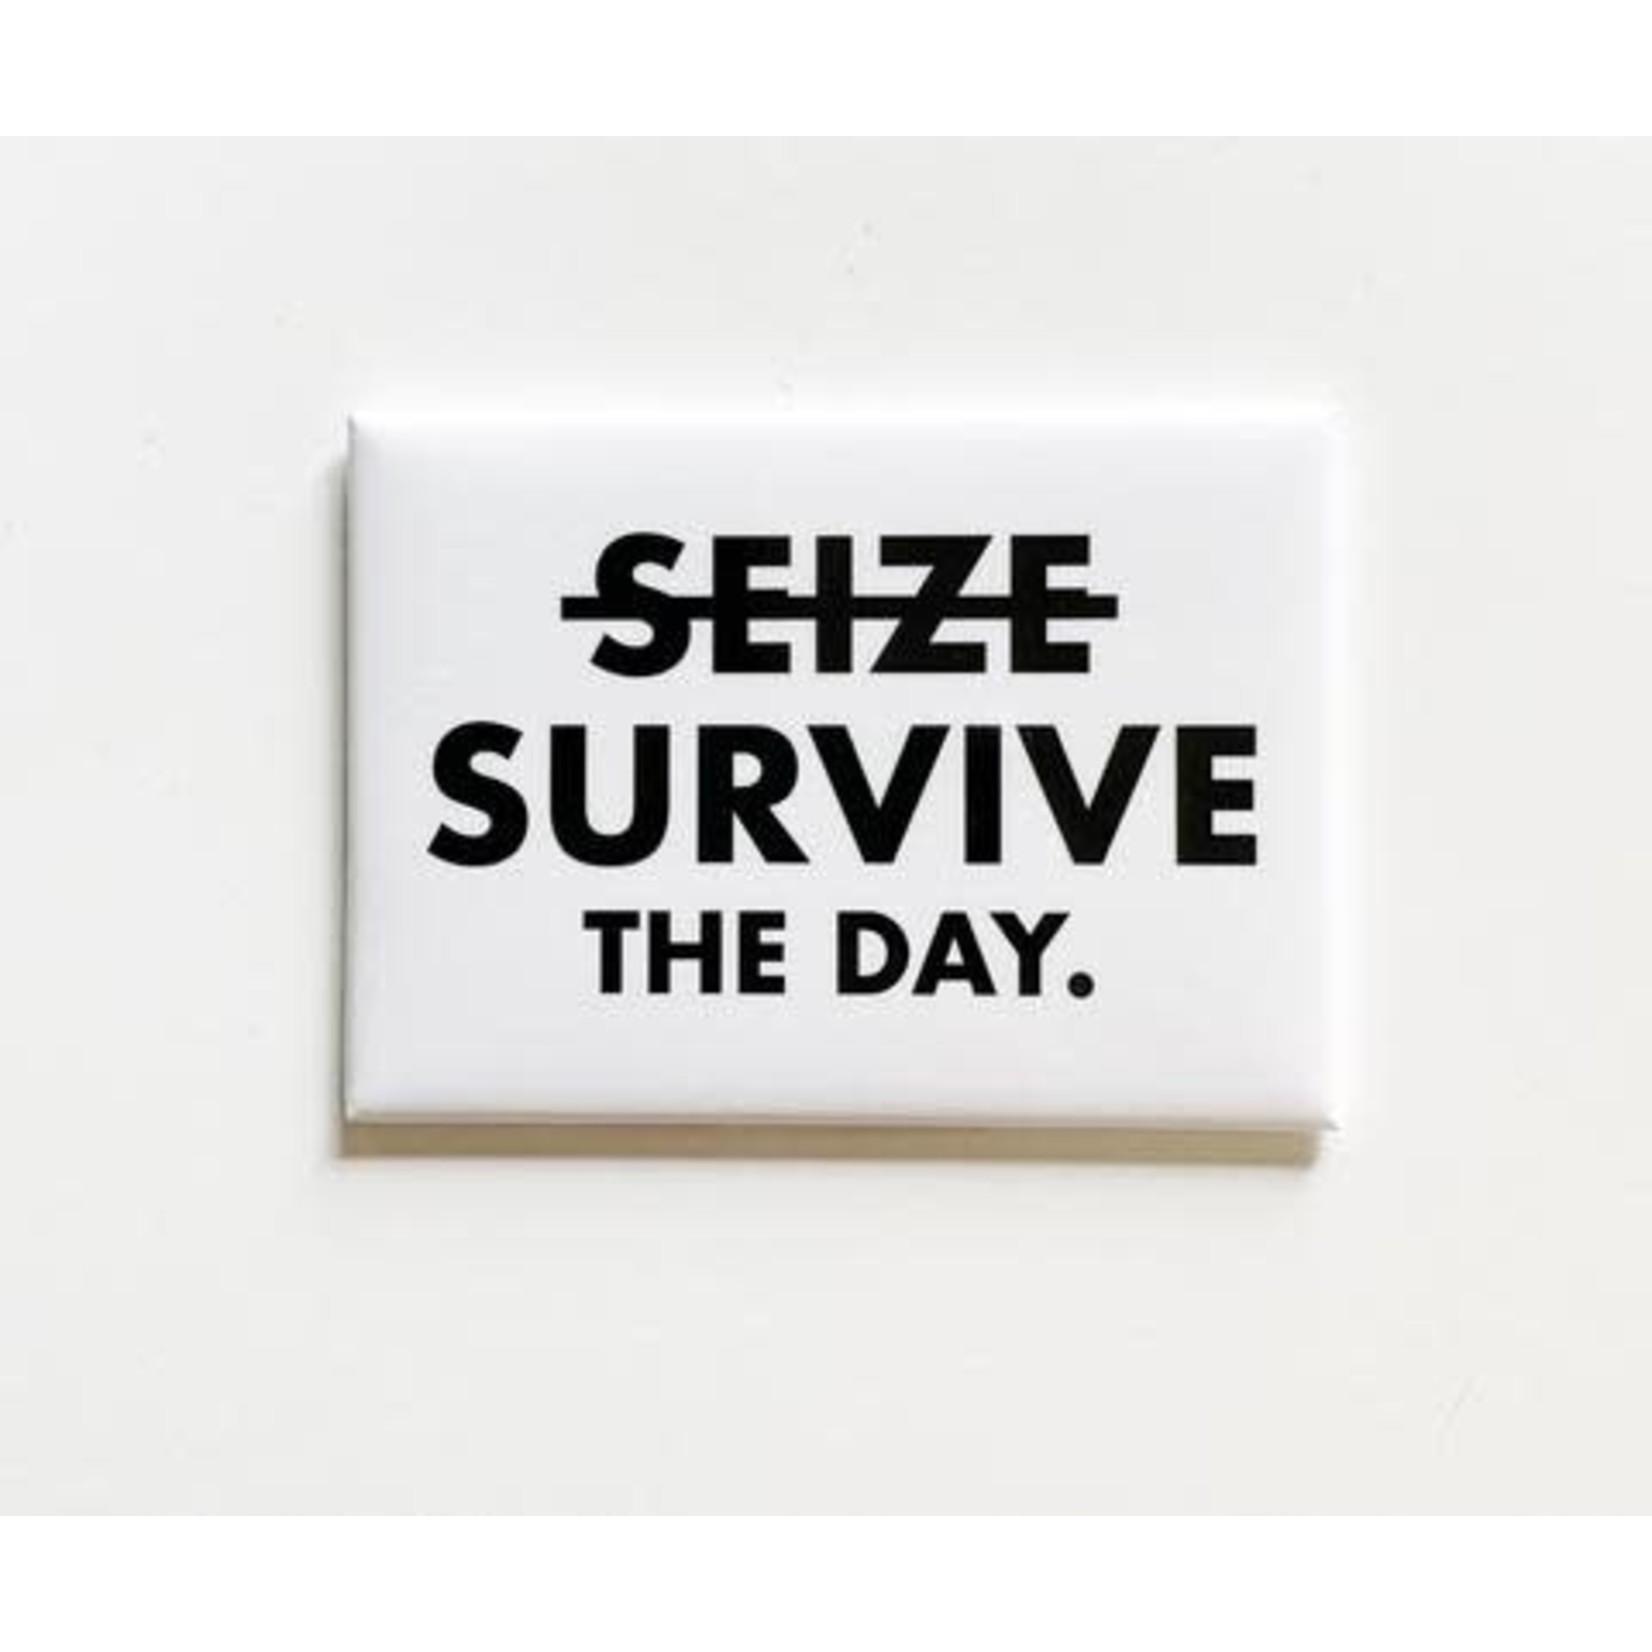 Sticker - Seize / Survive The Day